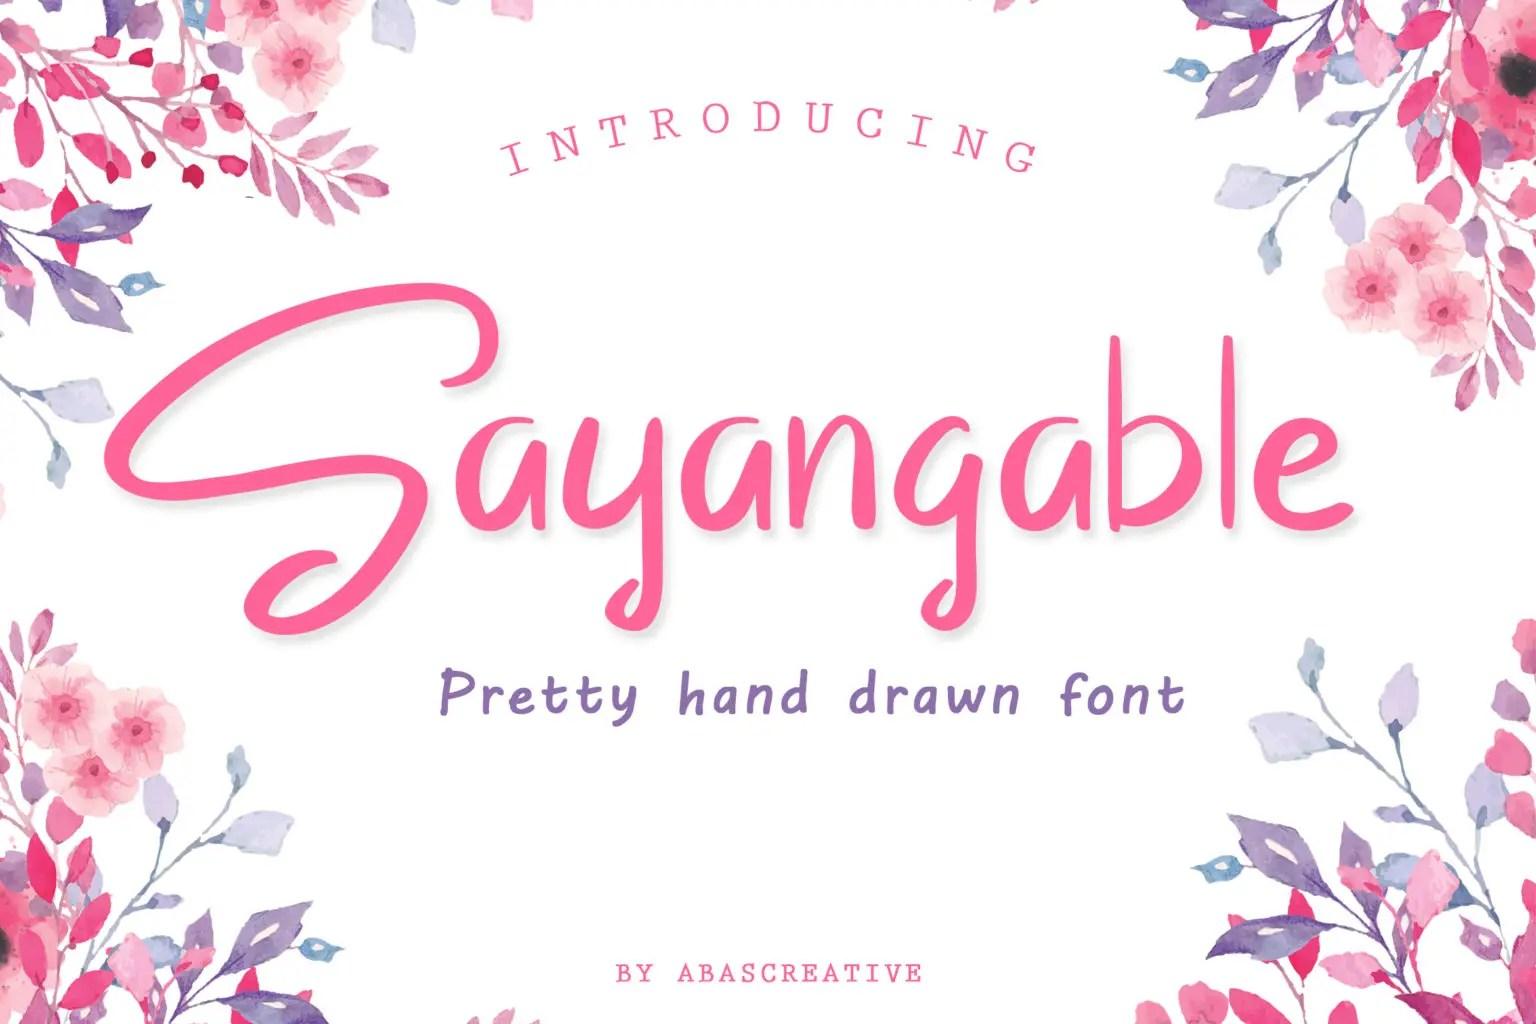 Sayangable Hand drawn Font-1